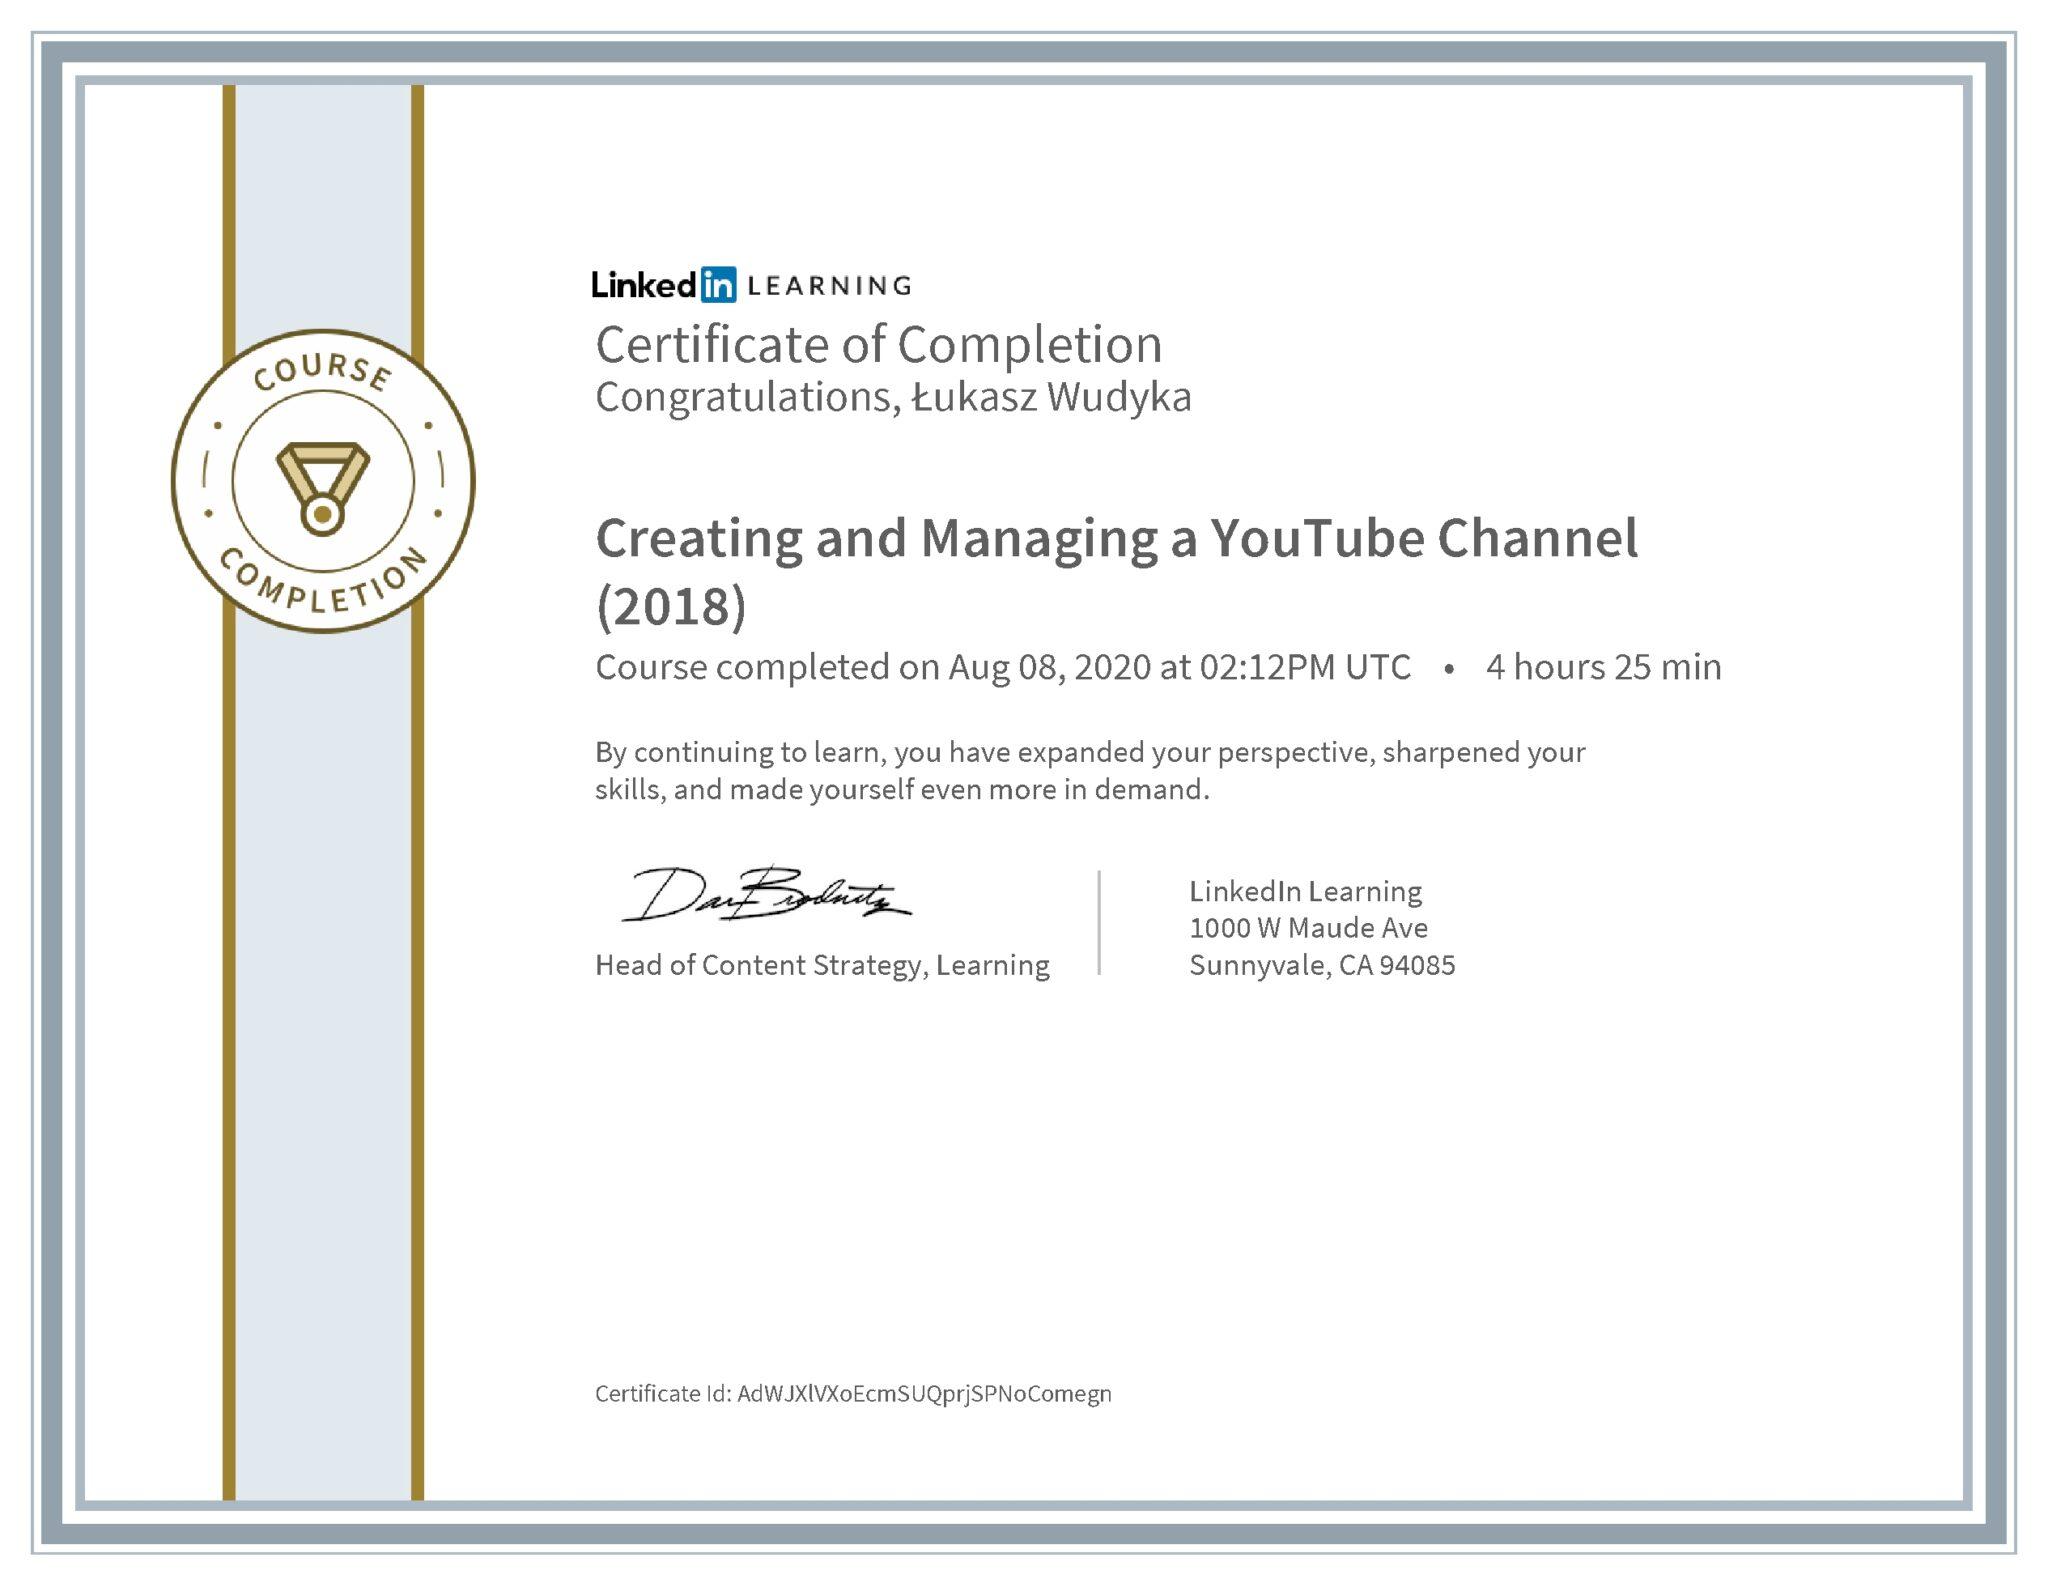 Łukasz Wudyka certyfikat LinkedIn Creating and Managing a YouTube Channel (2018)